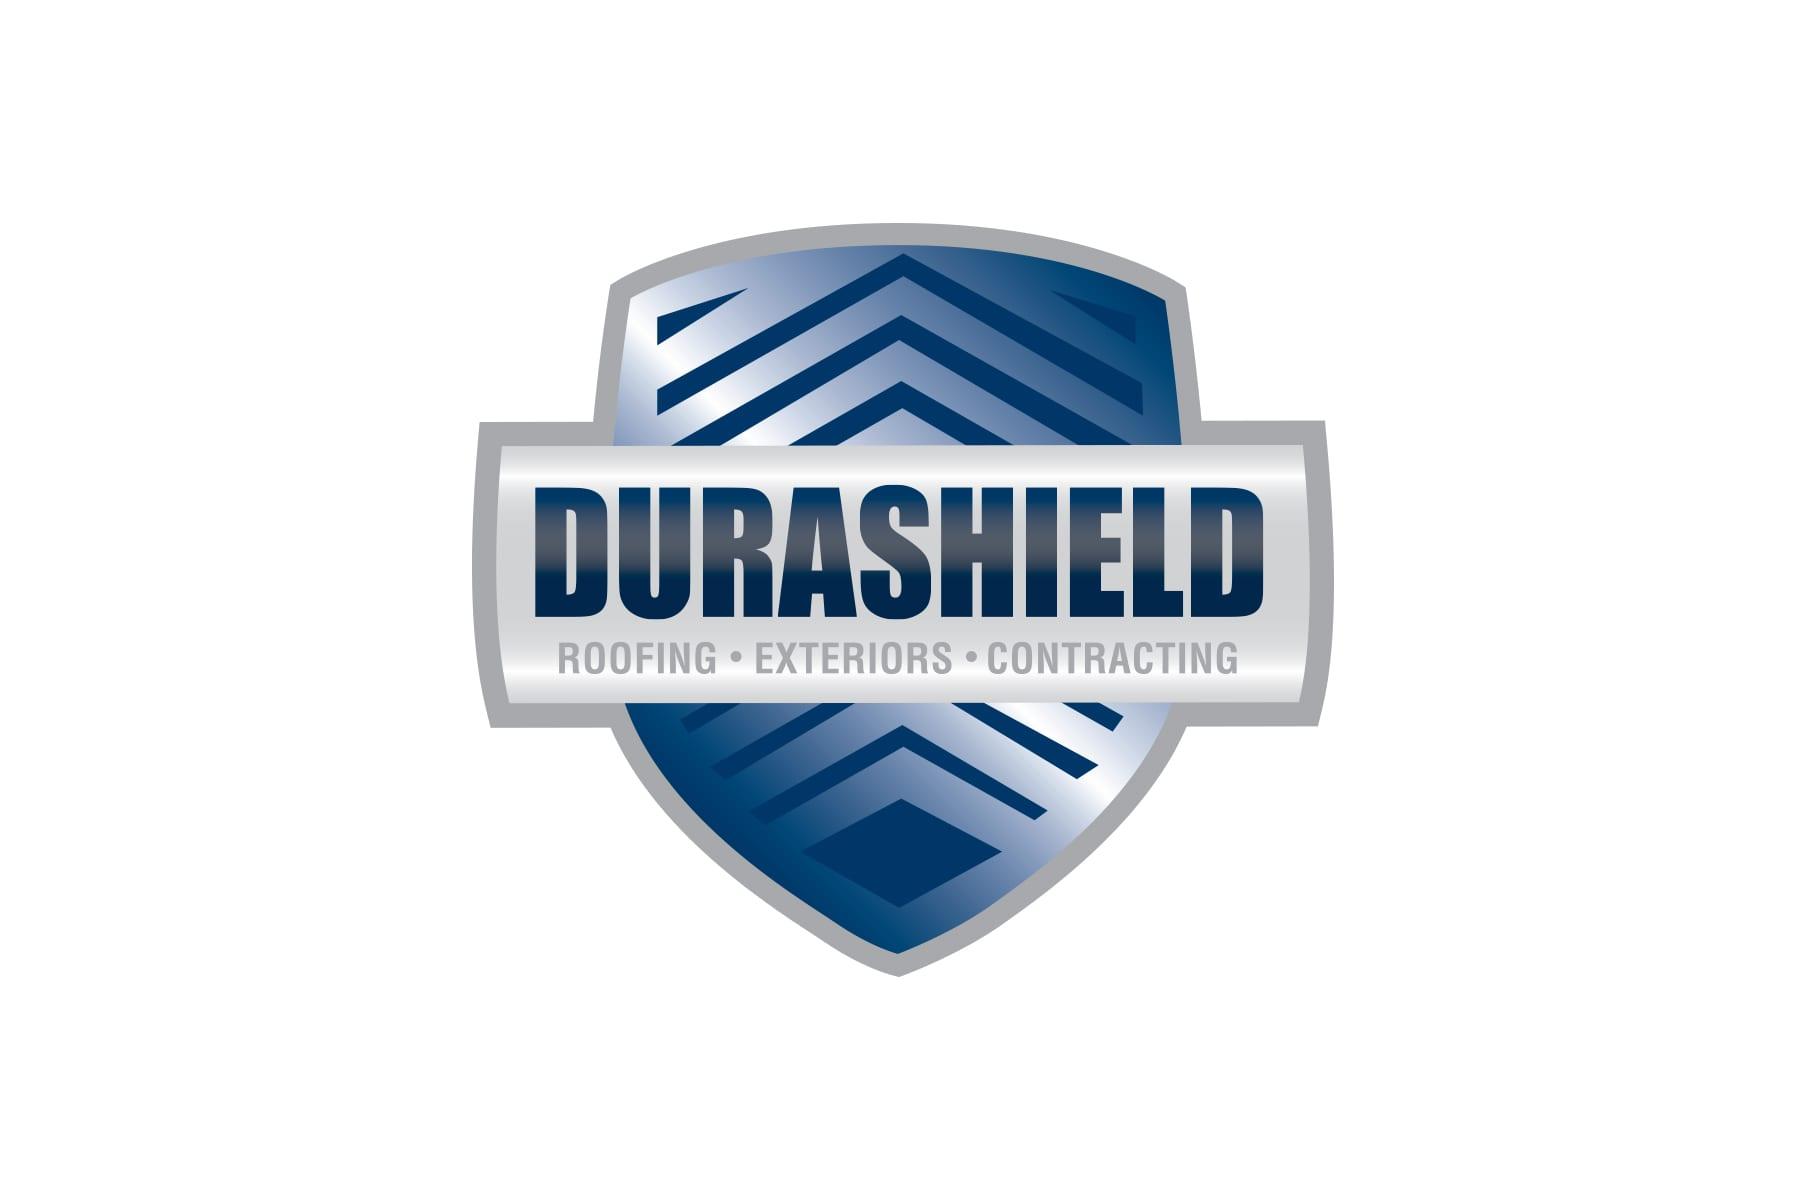 durashield-logo